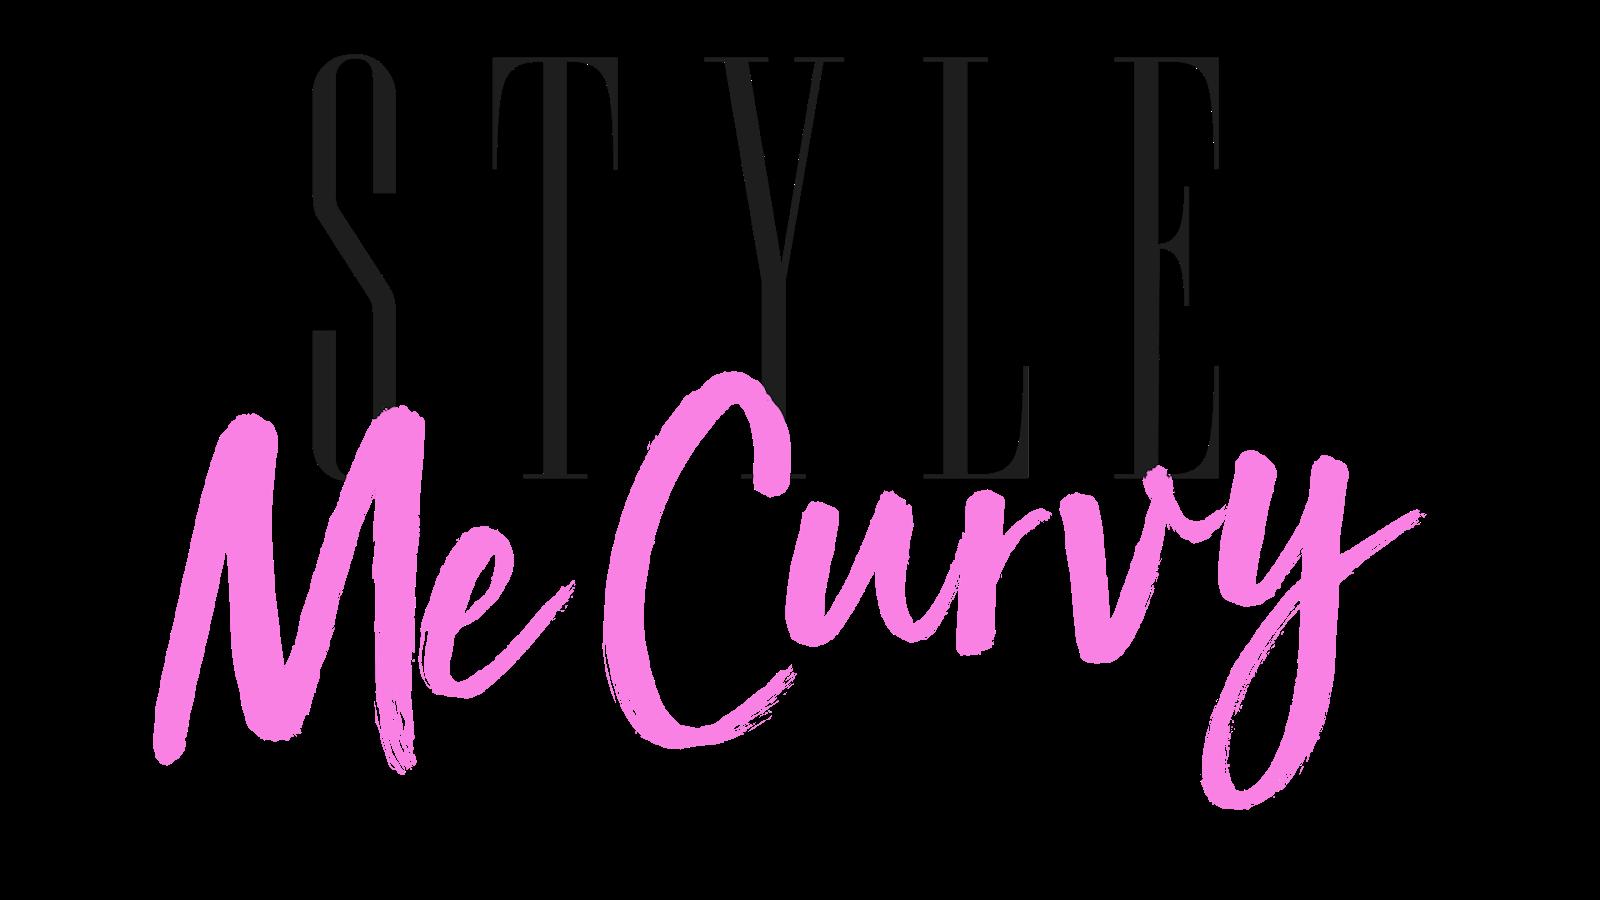 Style me curvy